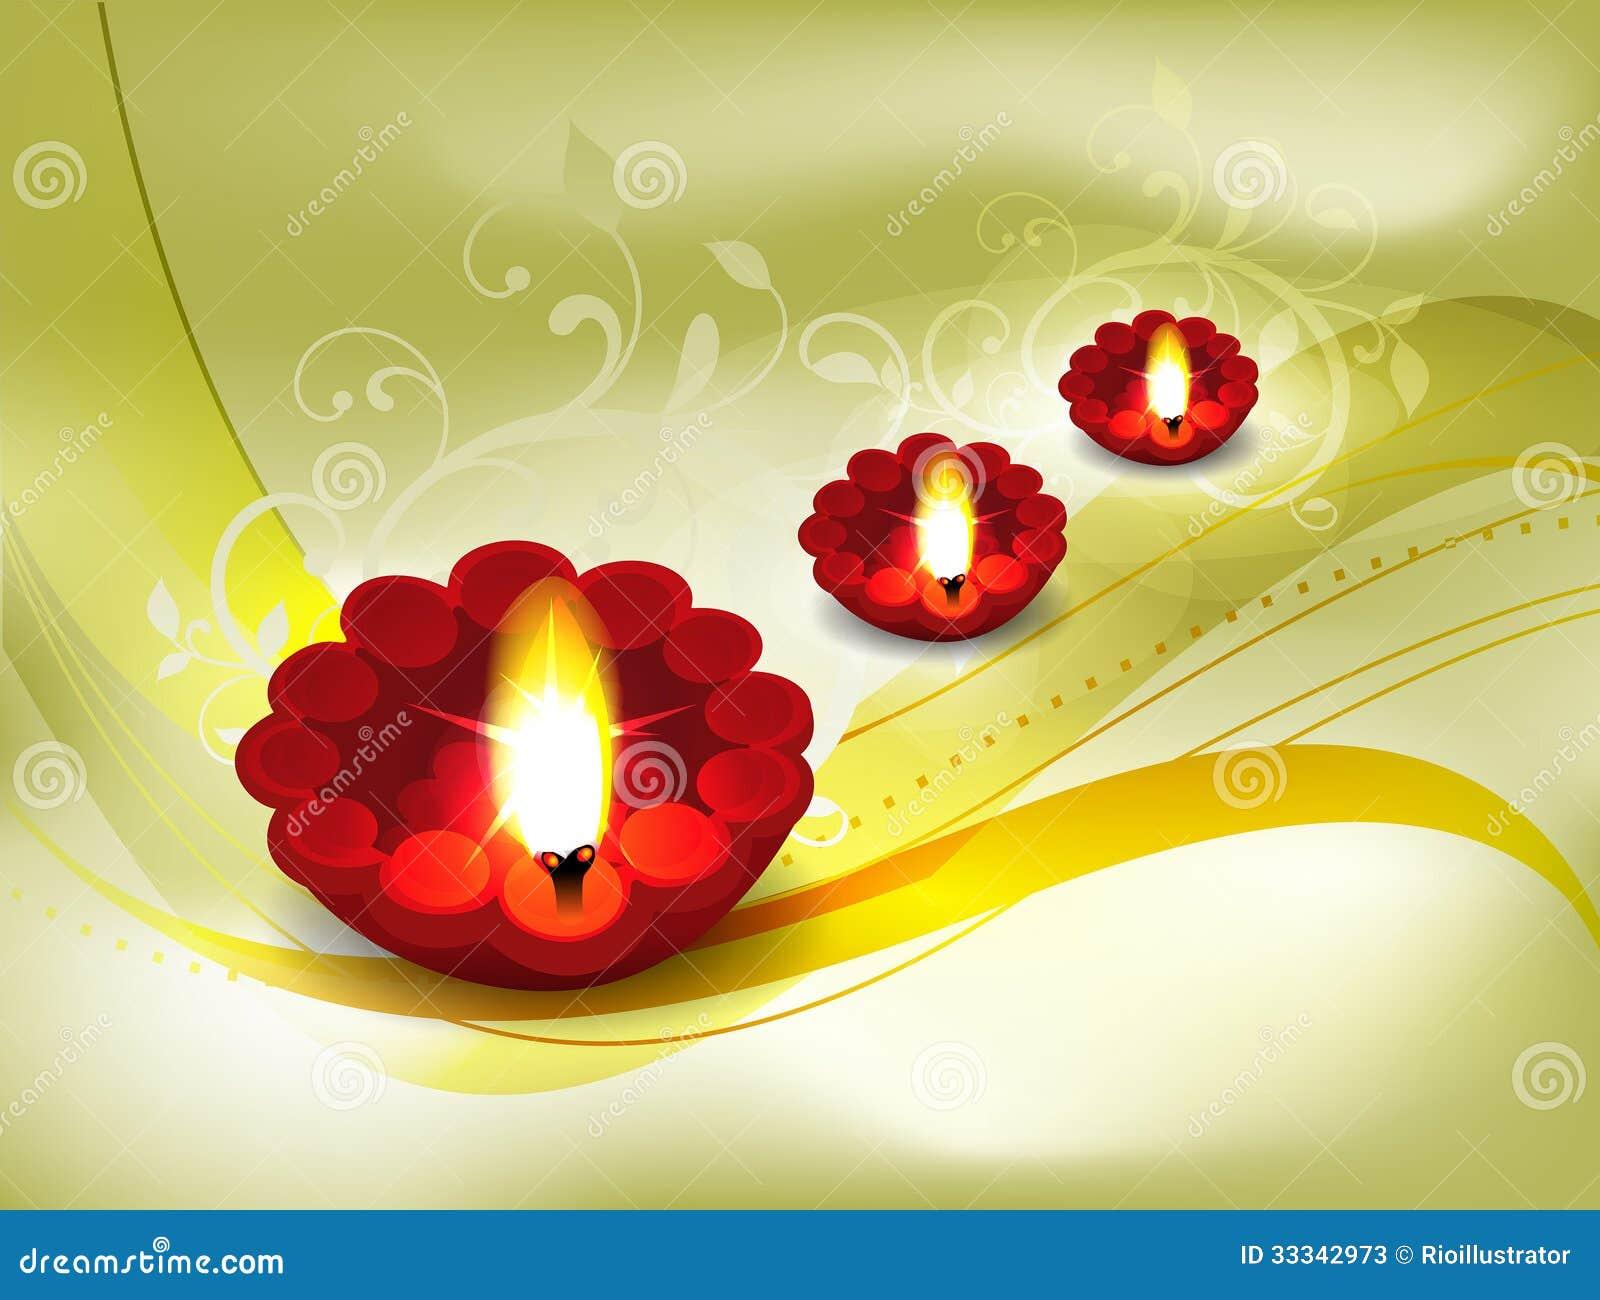 Golden diwali card design stock vector illustration of culture golden diwali card design m4hsunfo